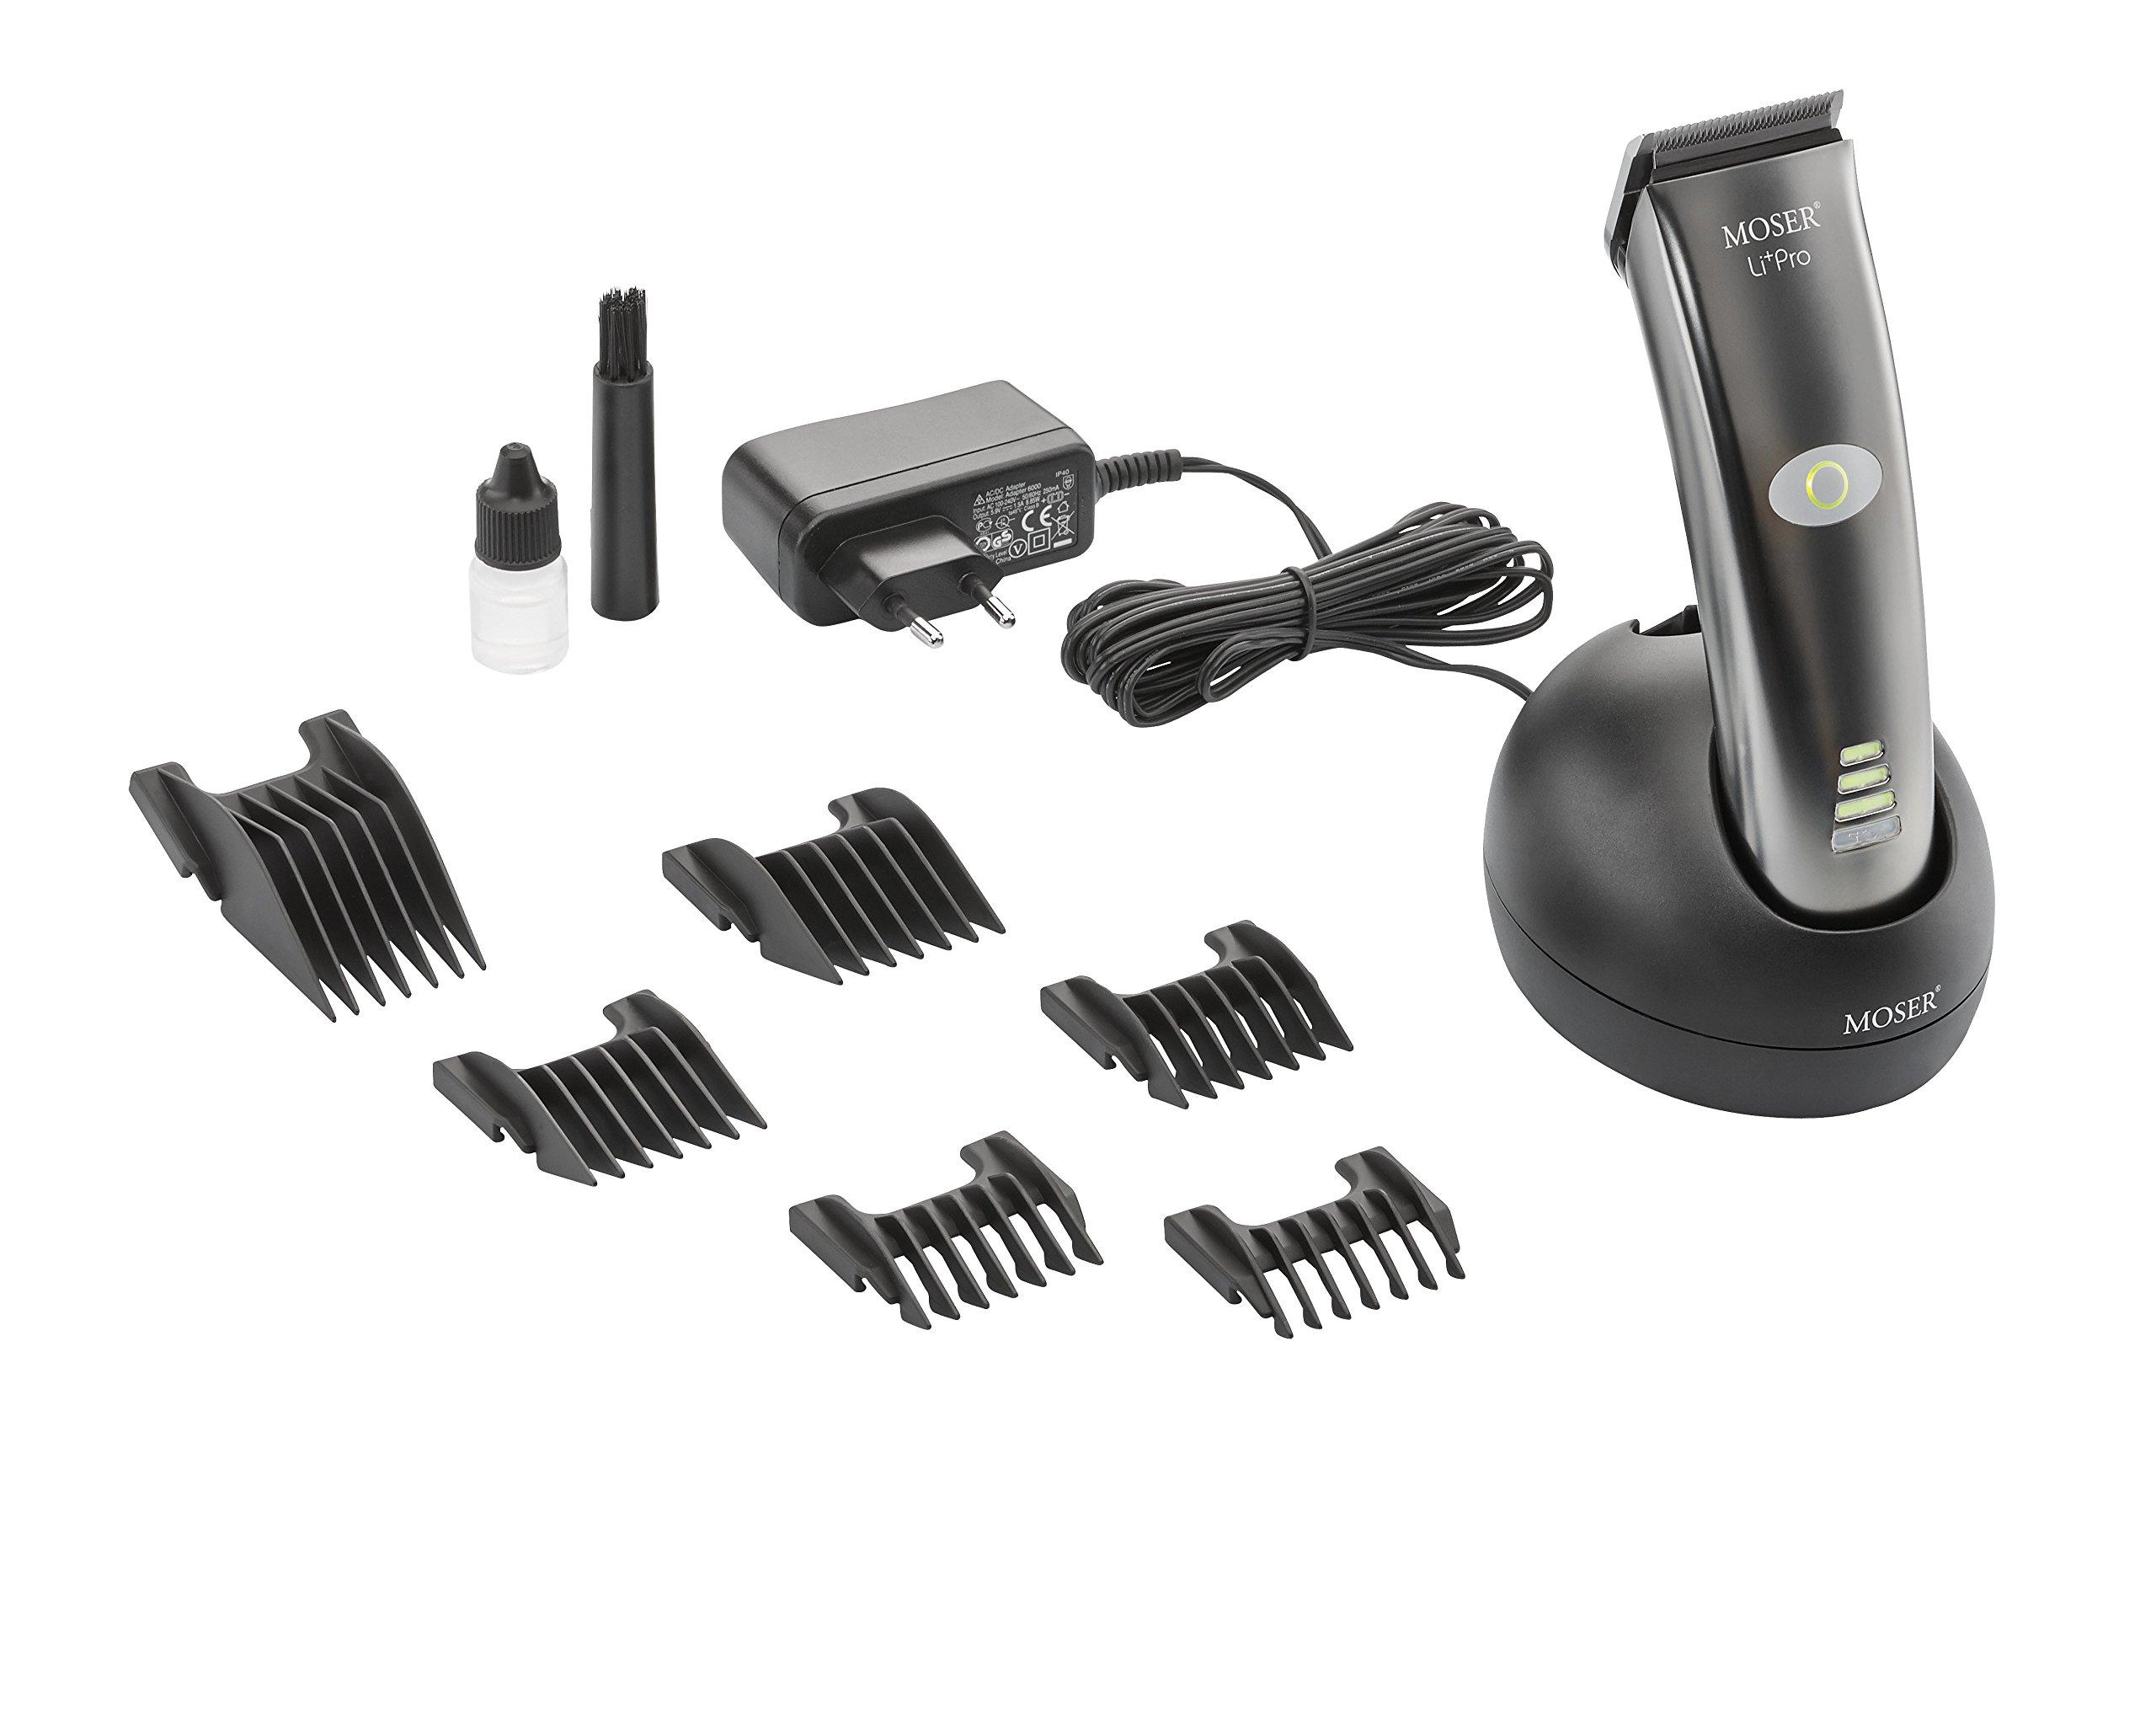 NEW MOSER LI+PRO 1884 Professional Hair Clipper Cord / Cordless 100-240V